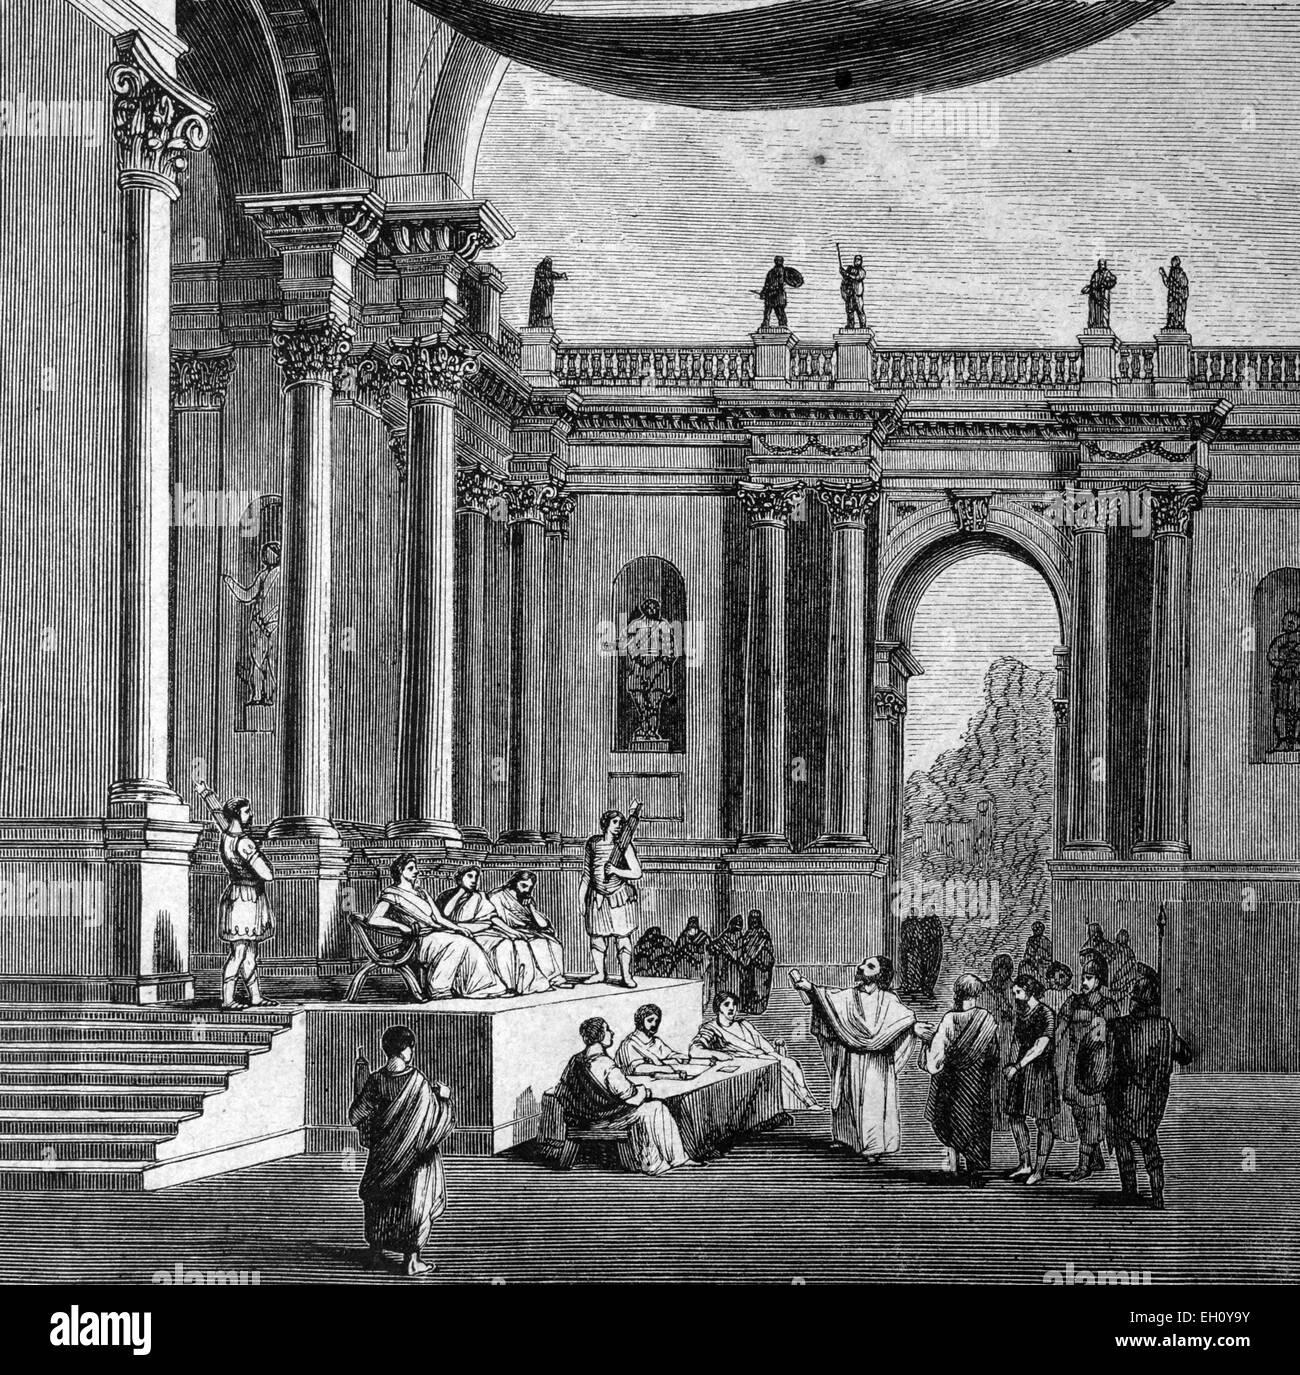 Hall of Justice im antiken Rom, historische Abbildung, ca. 1886 Stockbild